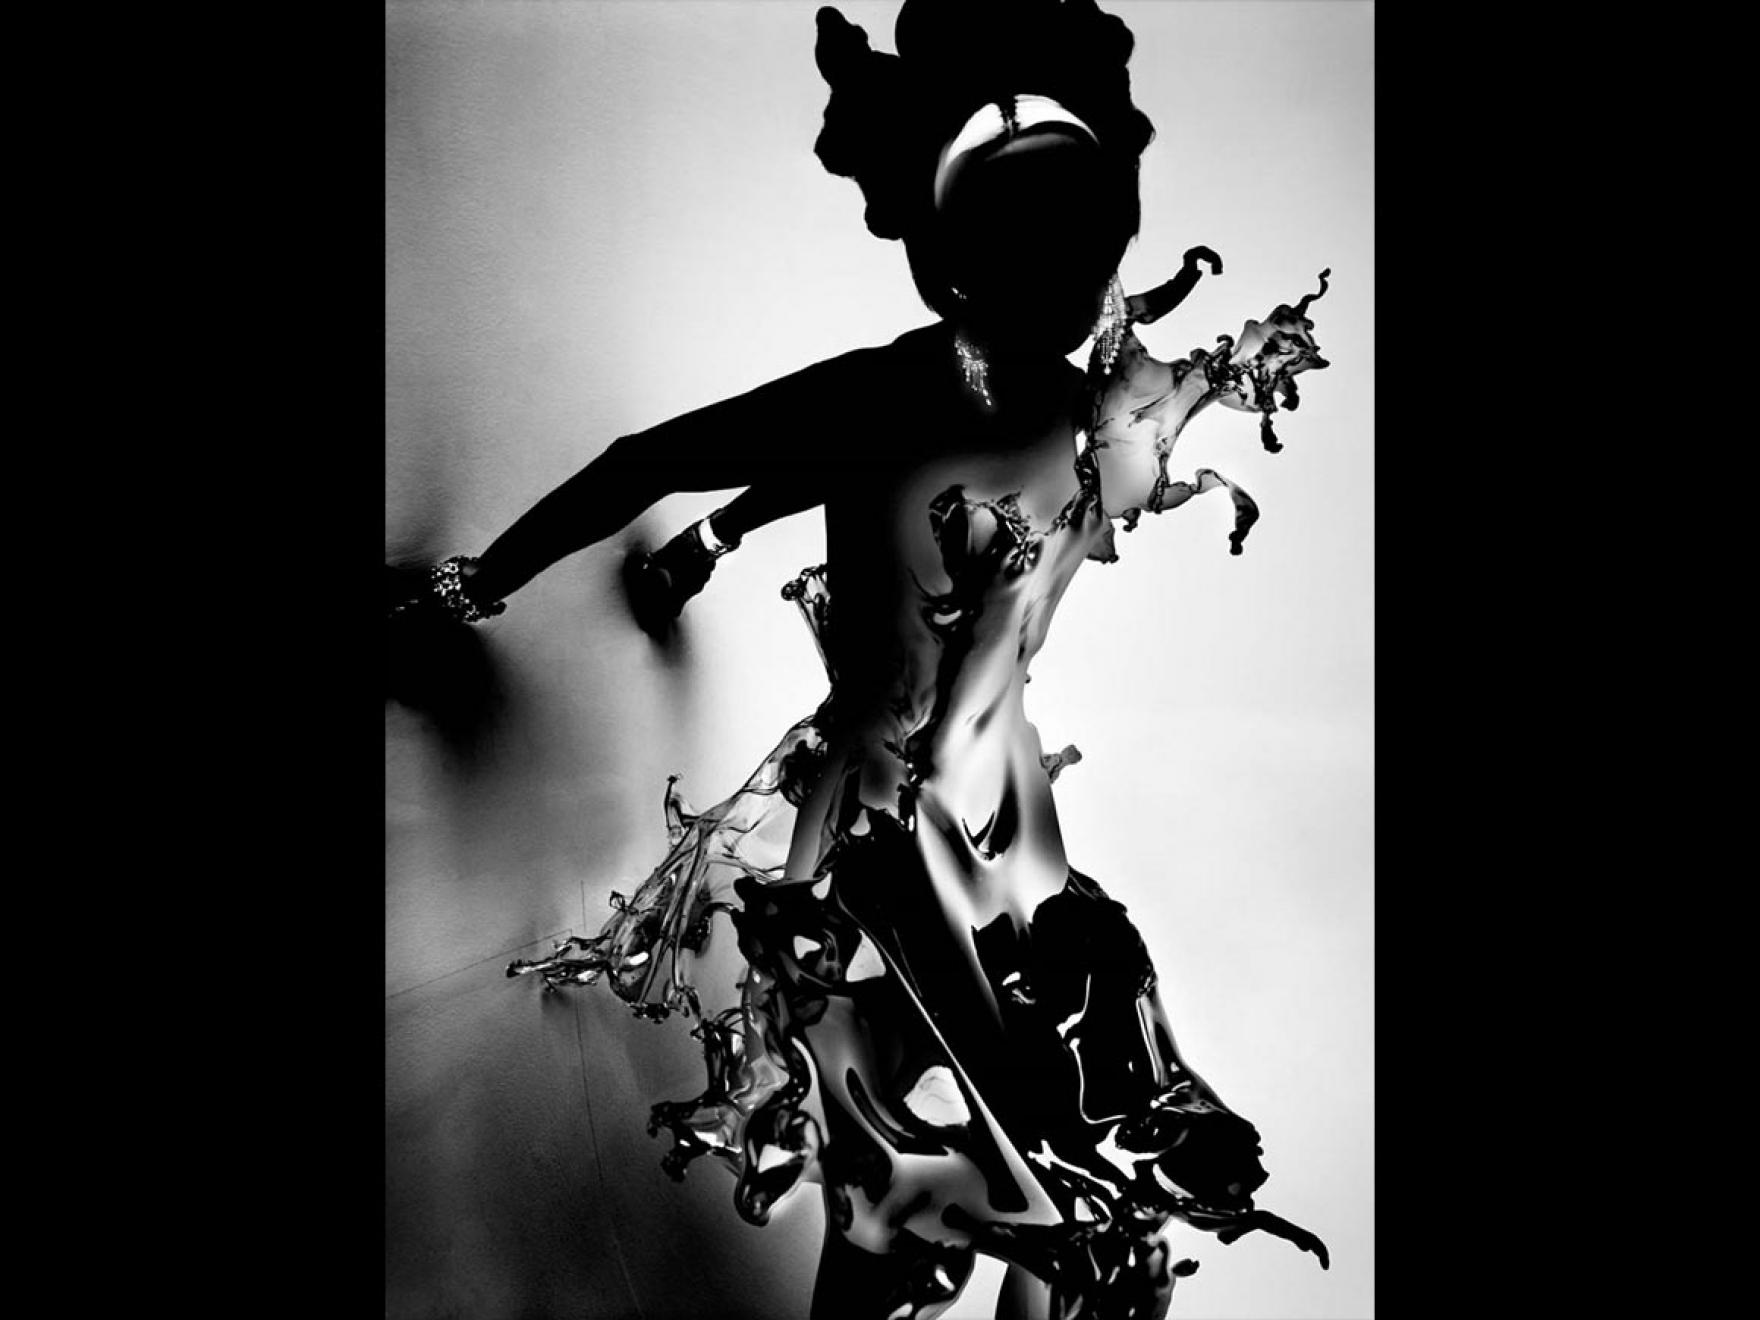 Silhouette of model wearing dress that resembles water splashing